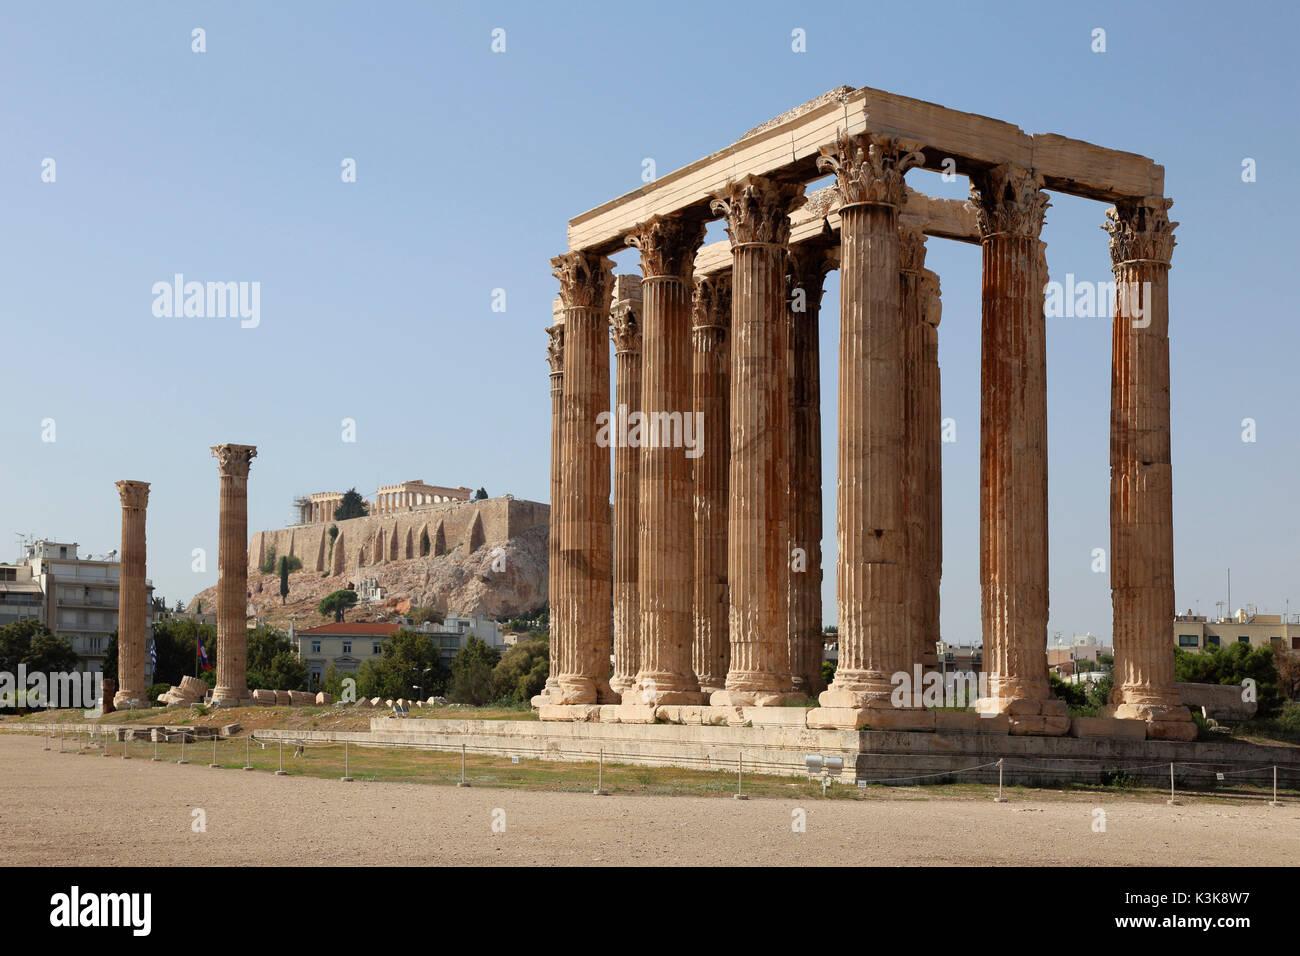 Greece Athens Temple of Olympian Zeus - Stock Image